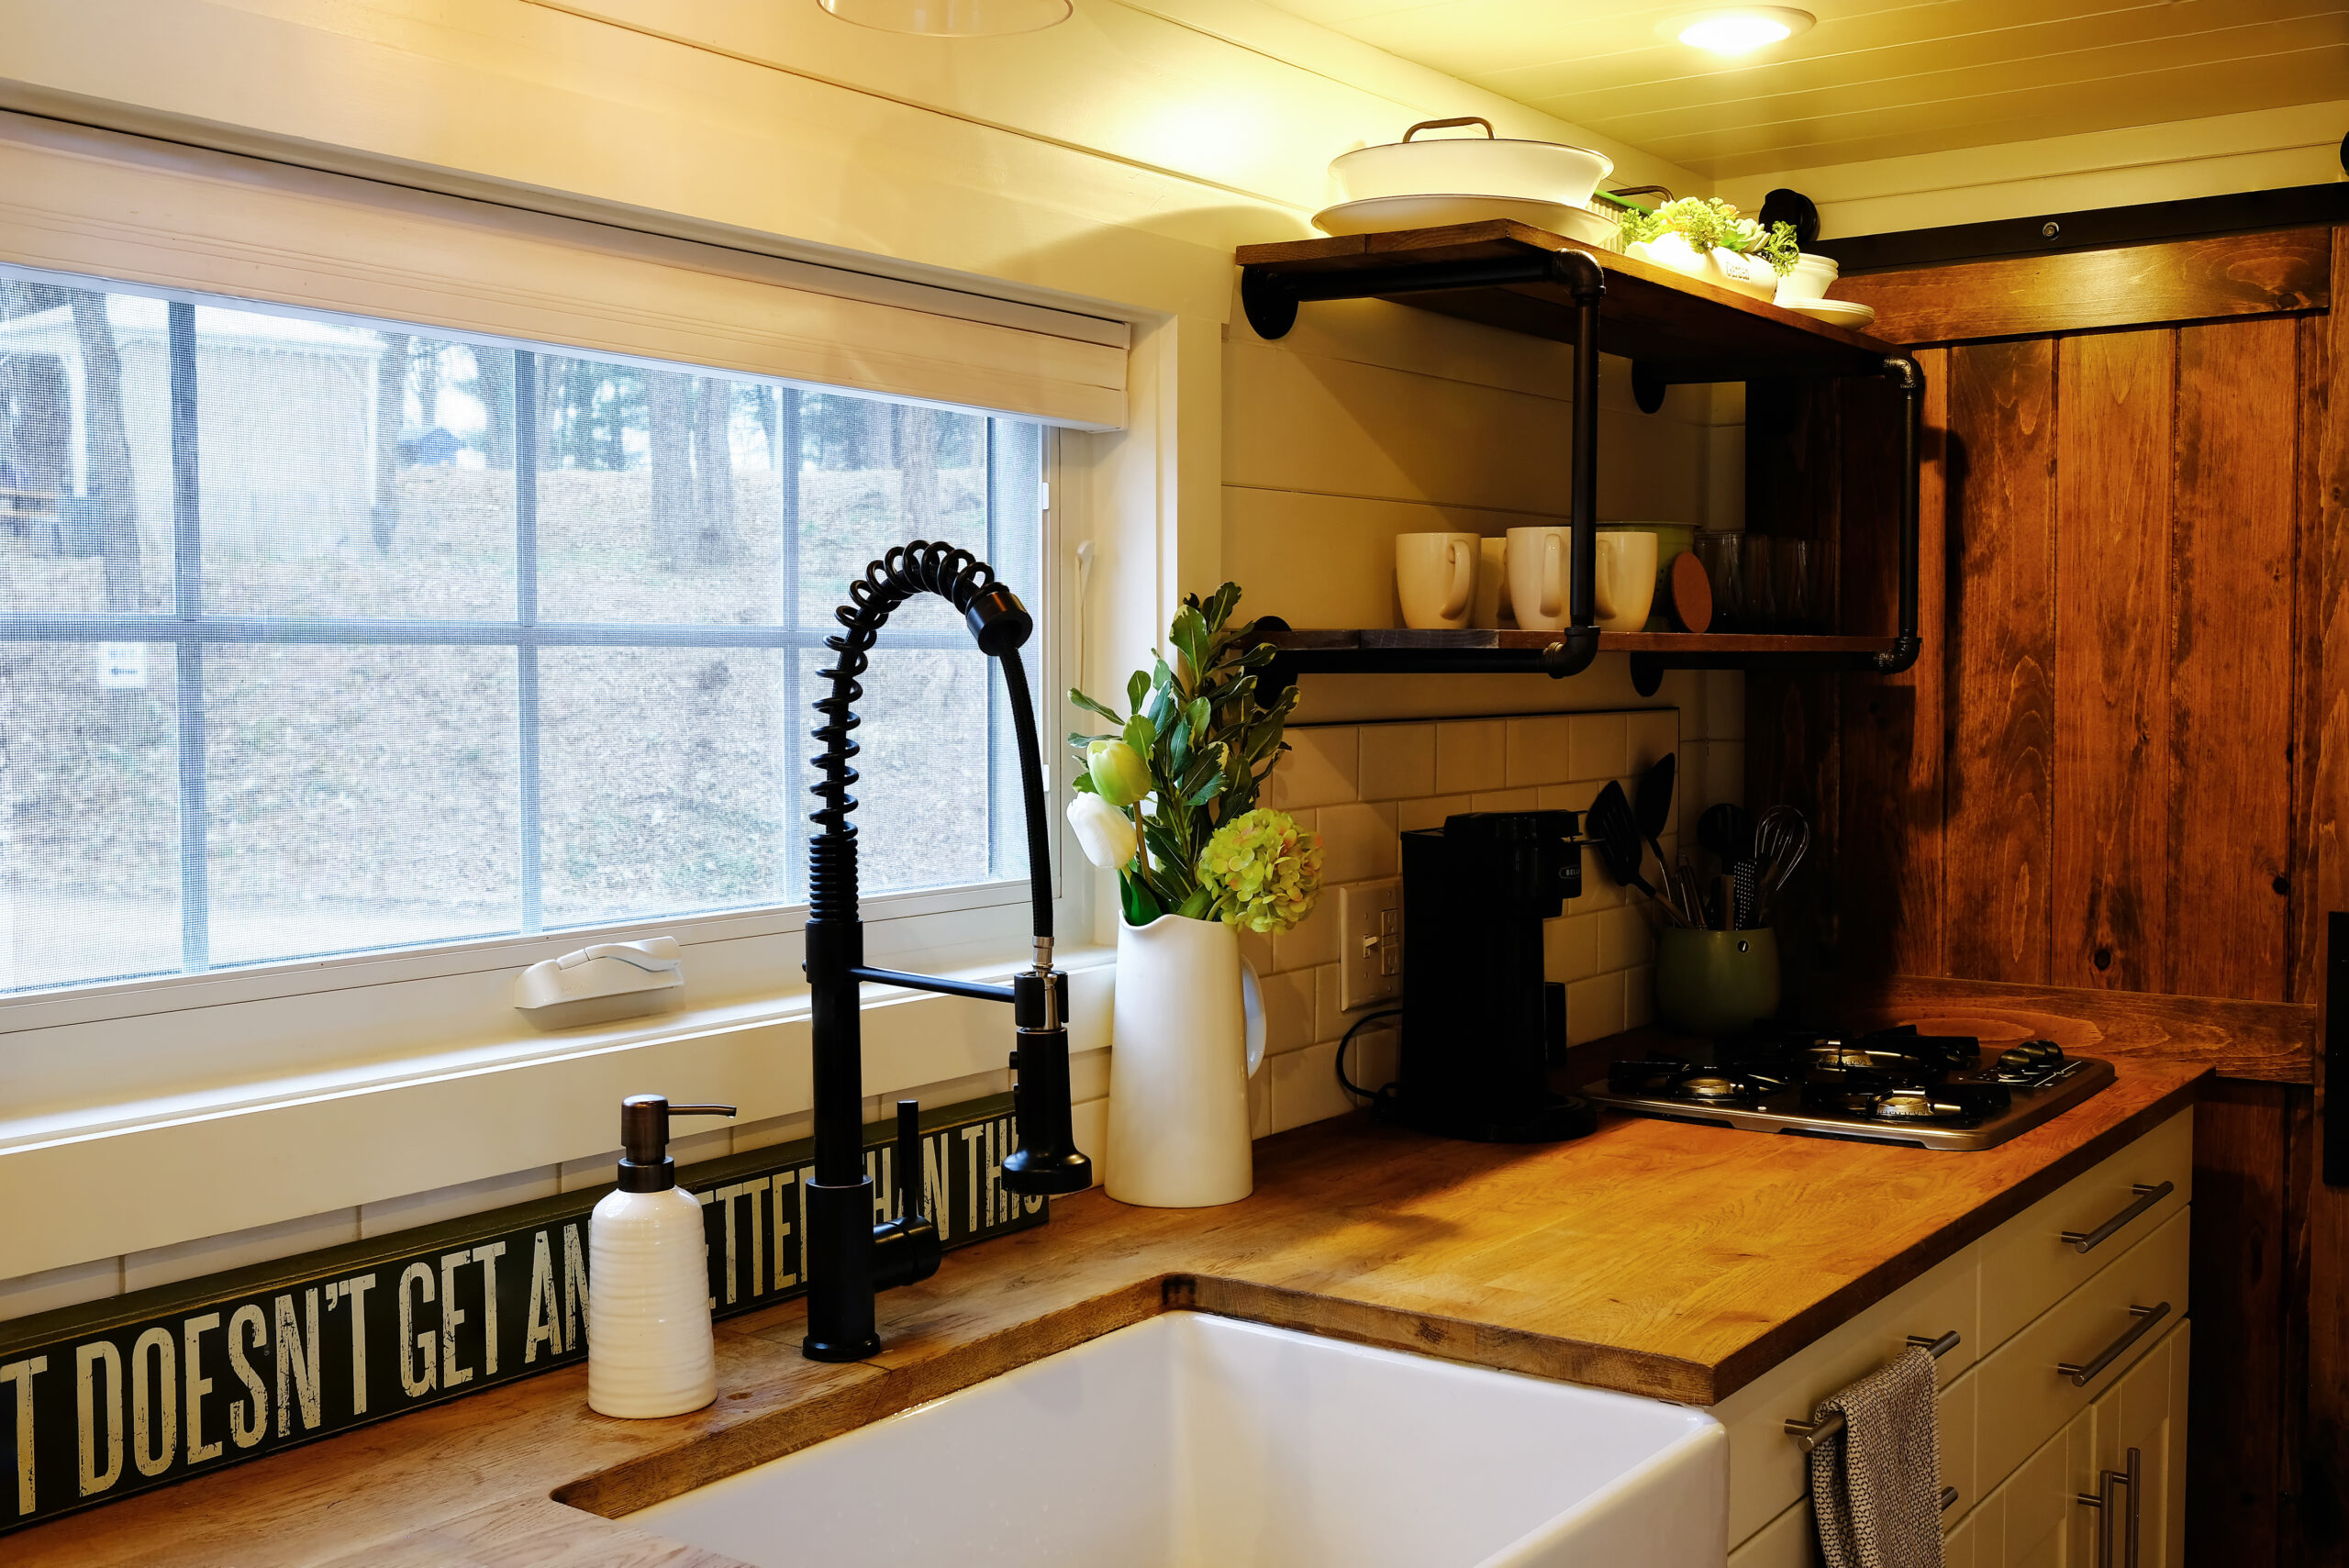 RV renovation of a small RV kitchen.